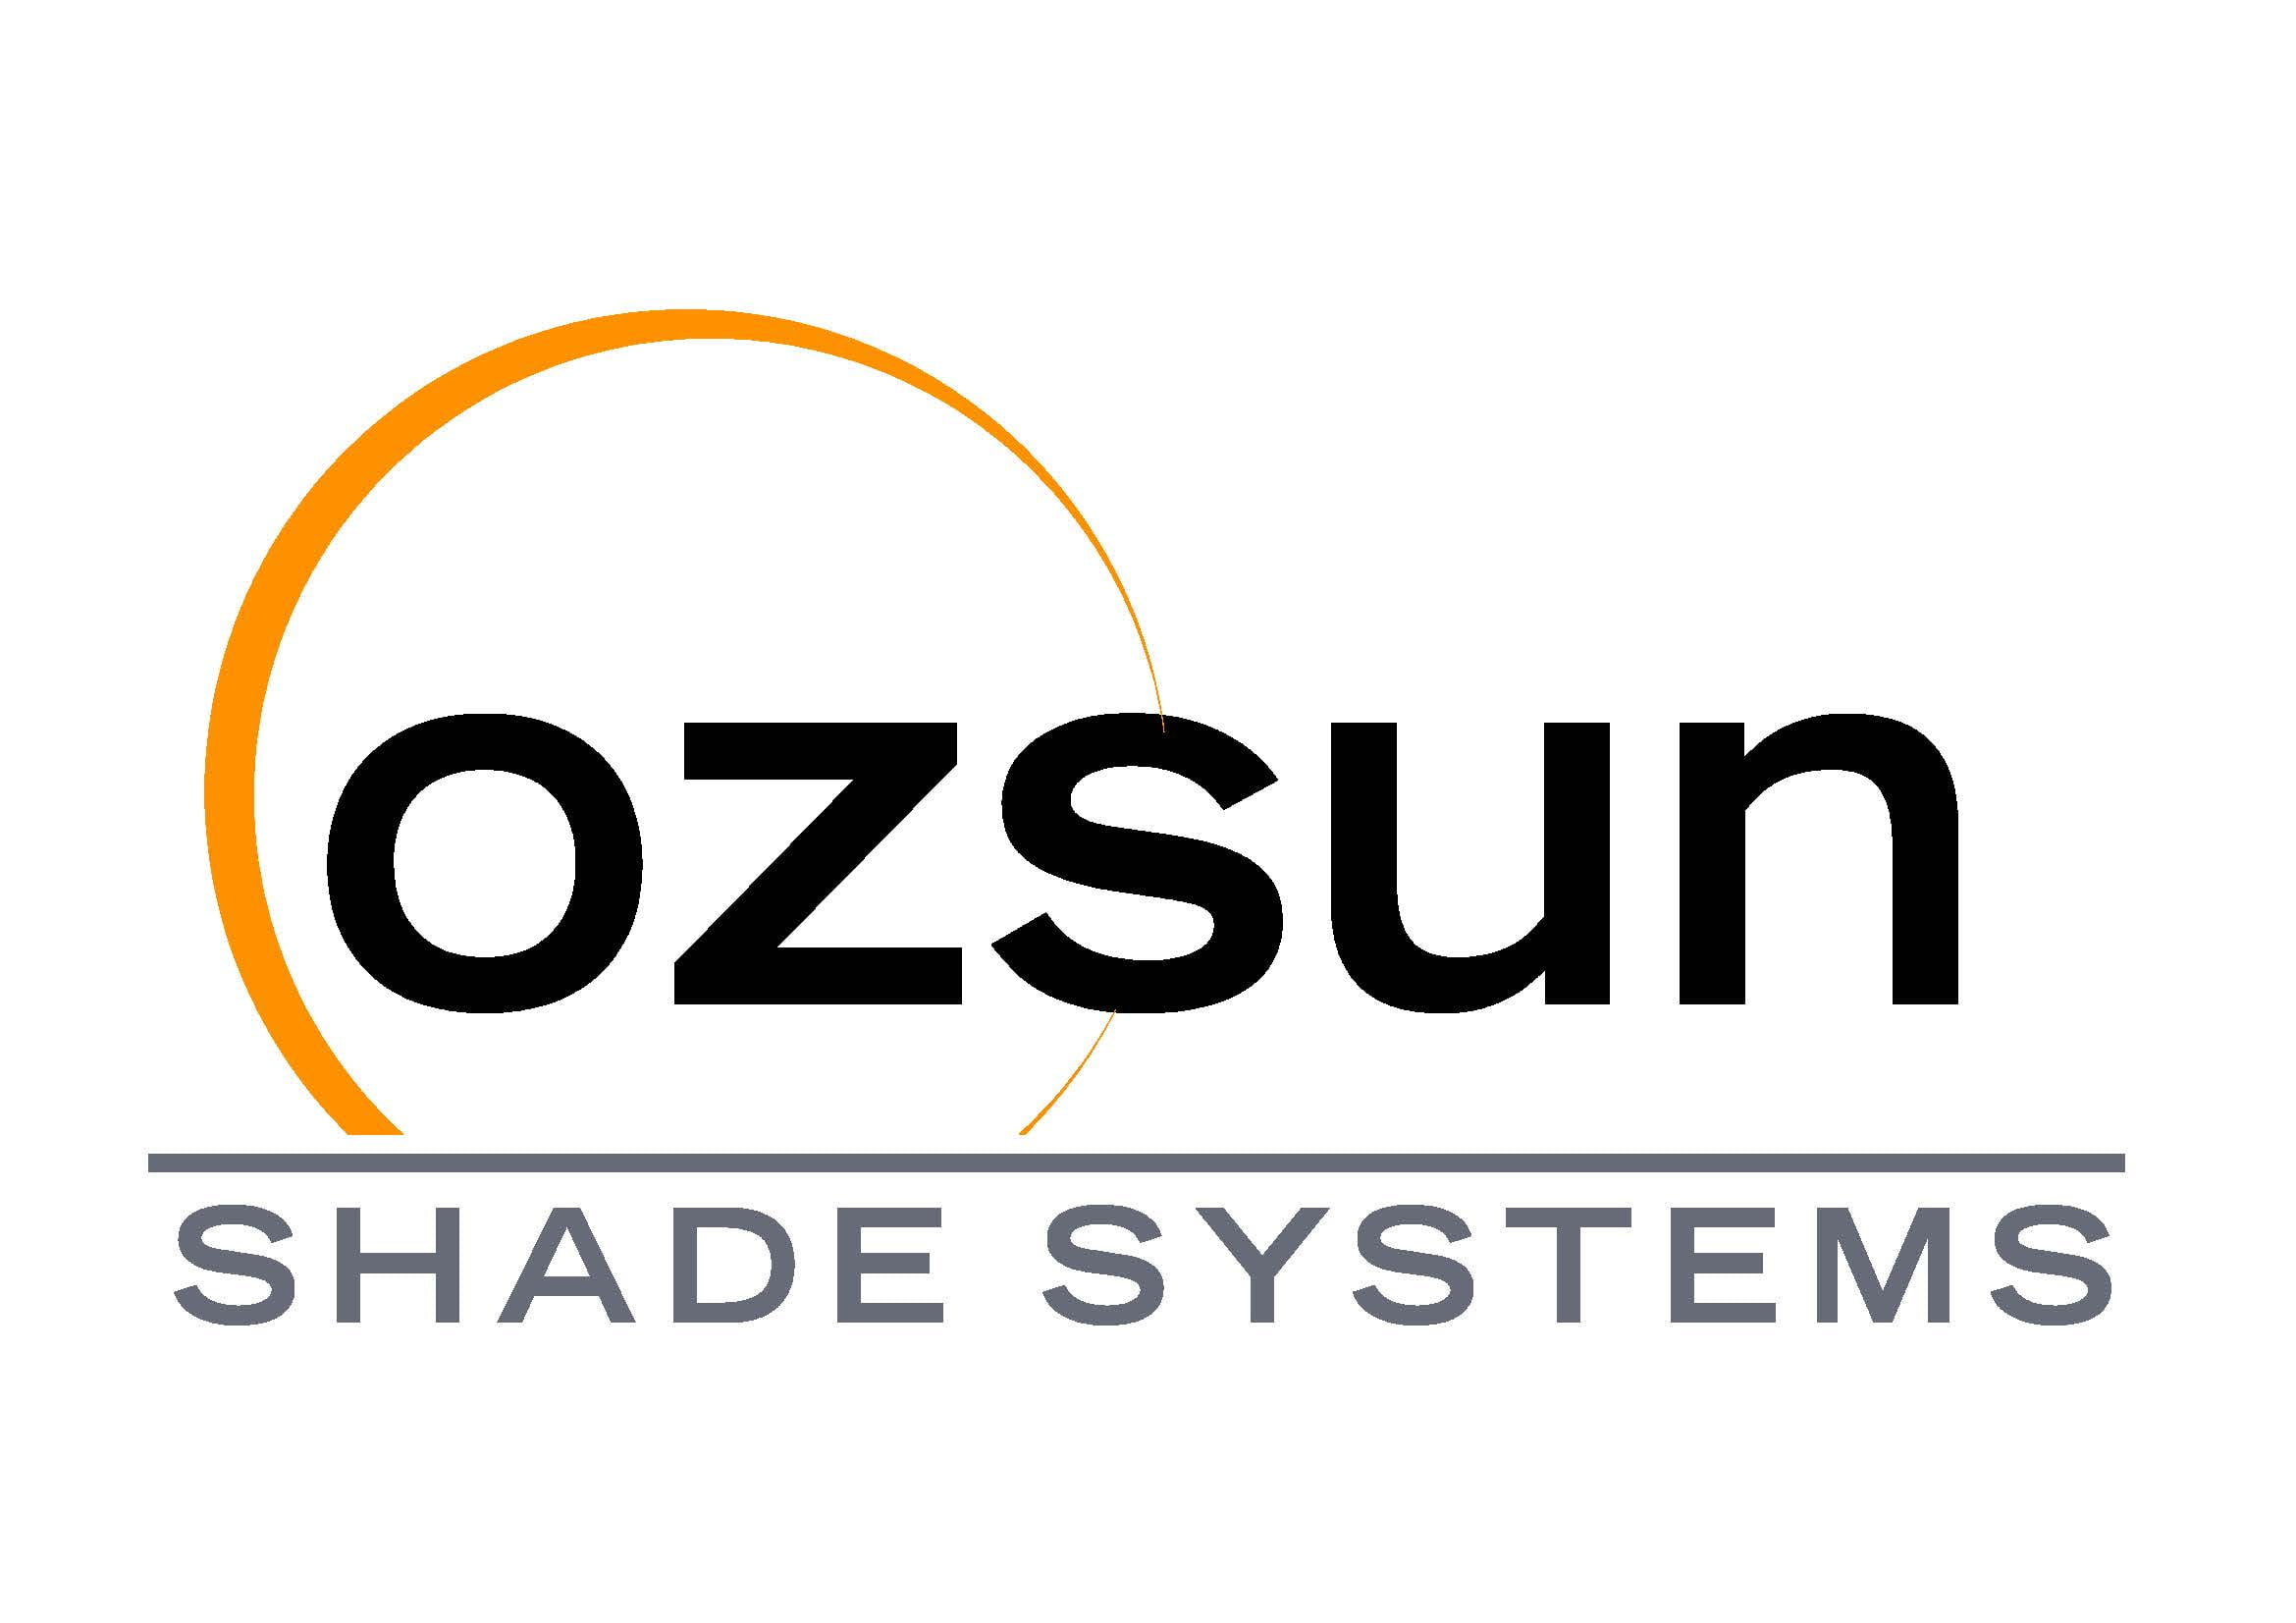 ozsun-shade-systems